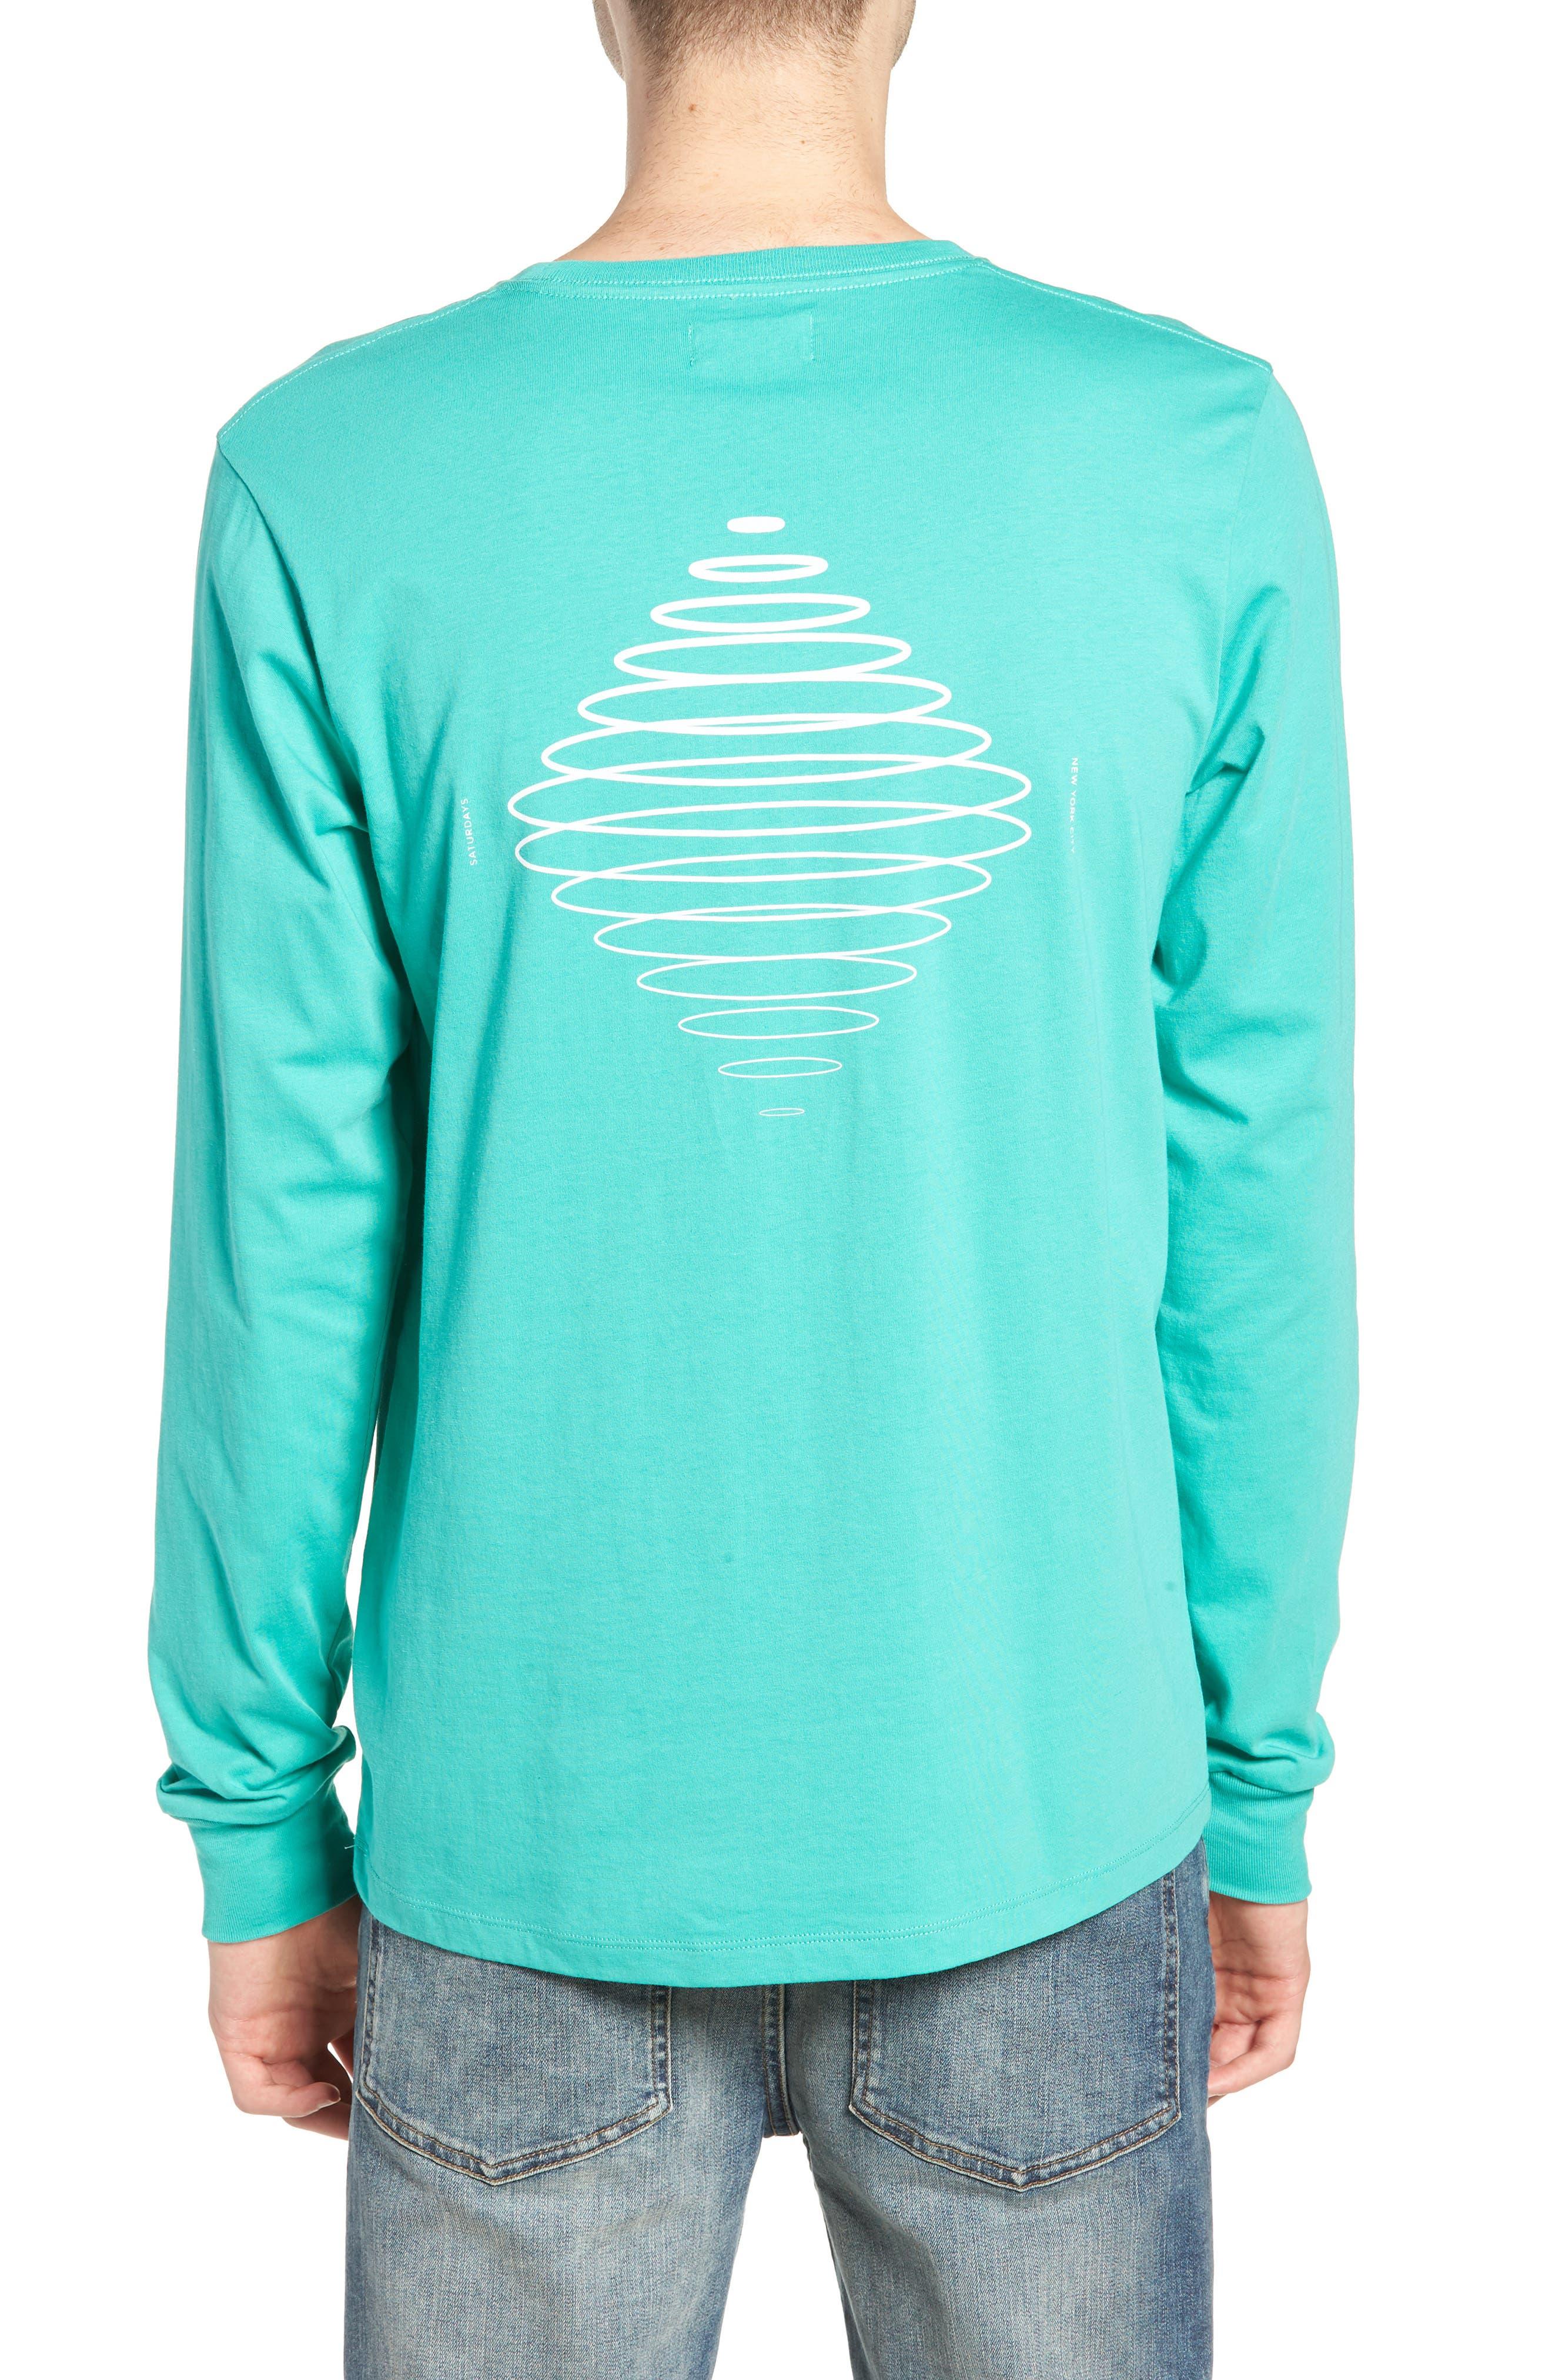 Diamond Spiral Long Sleeve T-Shirt,                             Alternate thumbnail 2, color,                             SEAFOAM GREEN